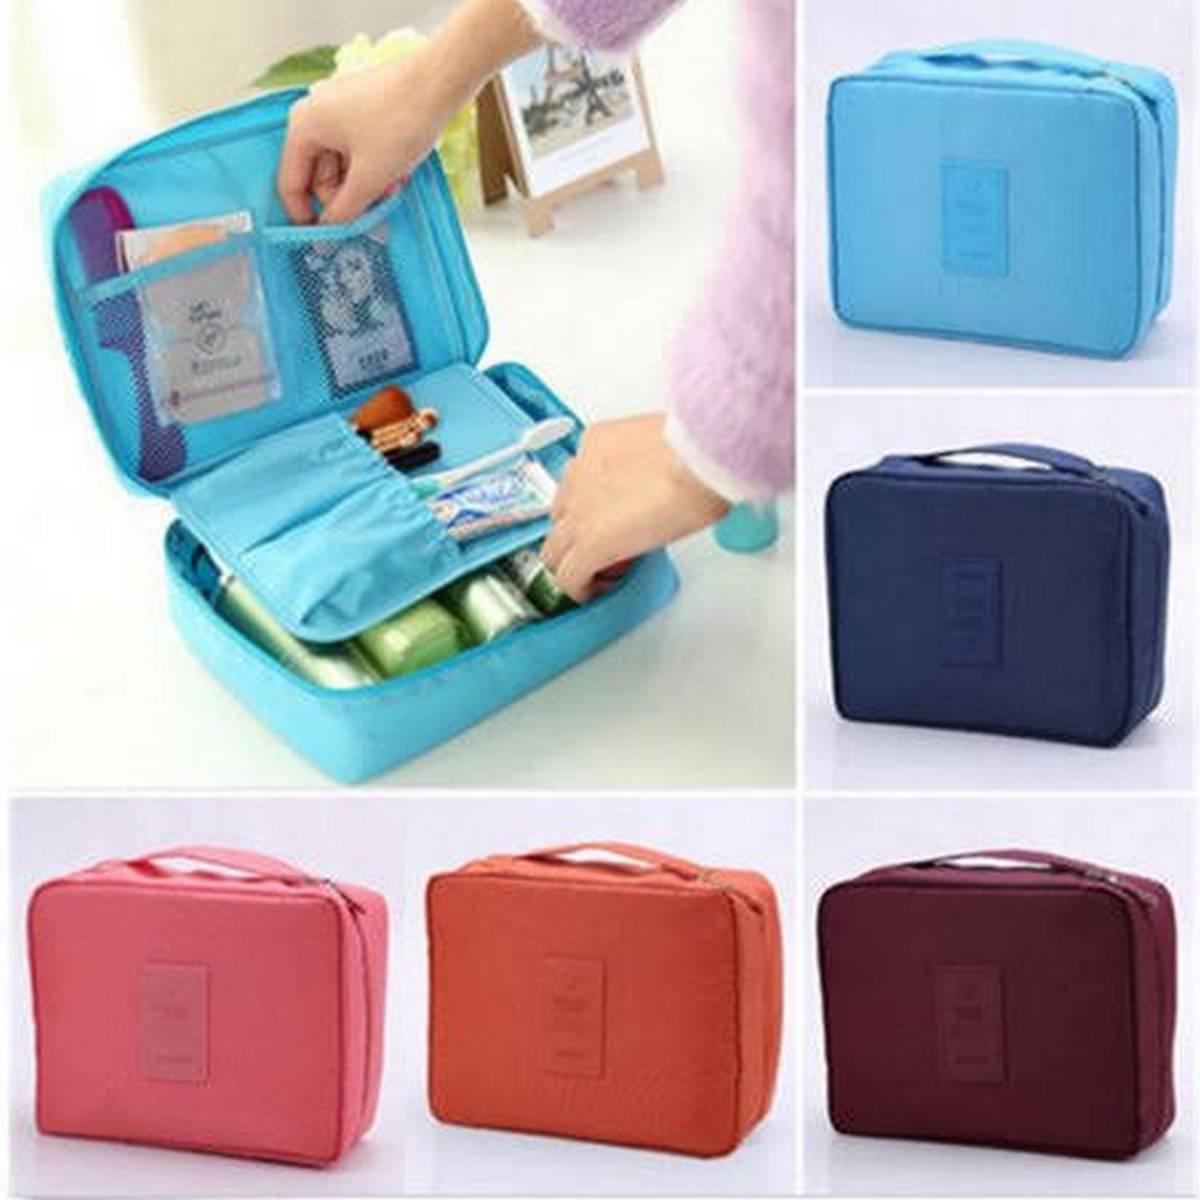 Travel Cosmetic Bag Women Zipper Make Up Bag Polyester High Capacity Makeup Case handbag Organizer Storage Wash Bath Bag